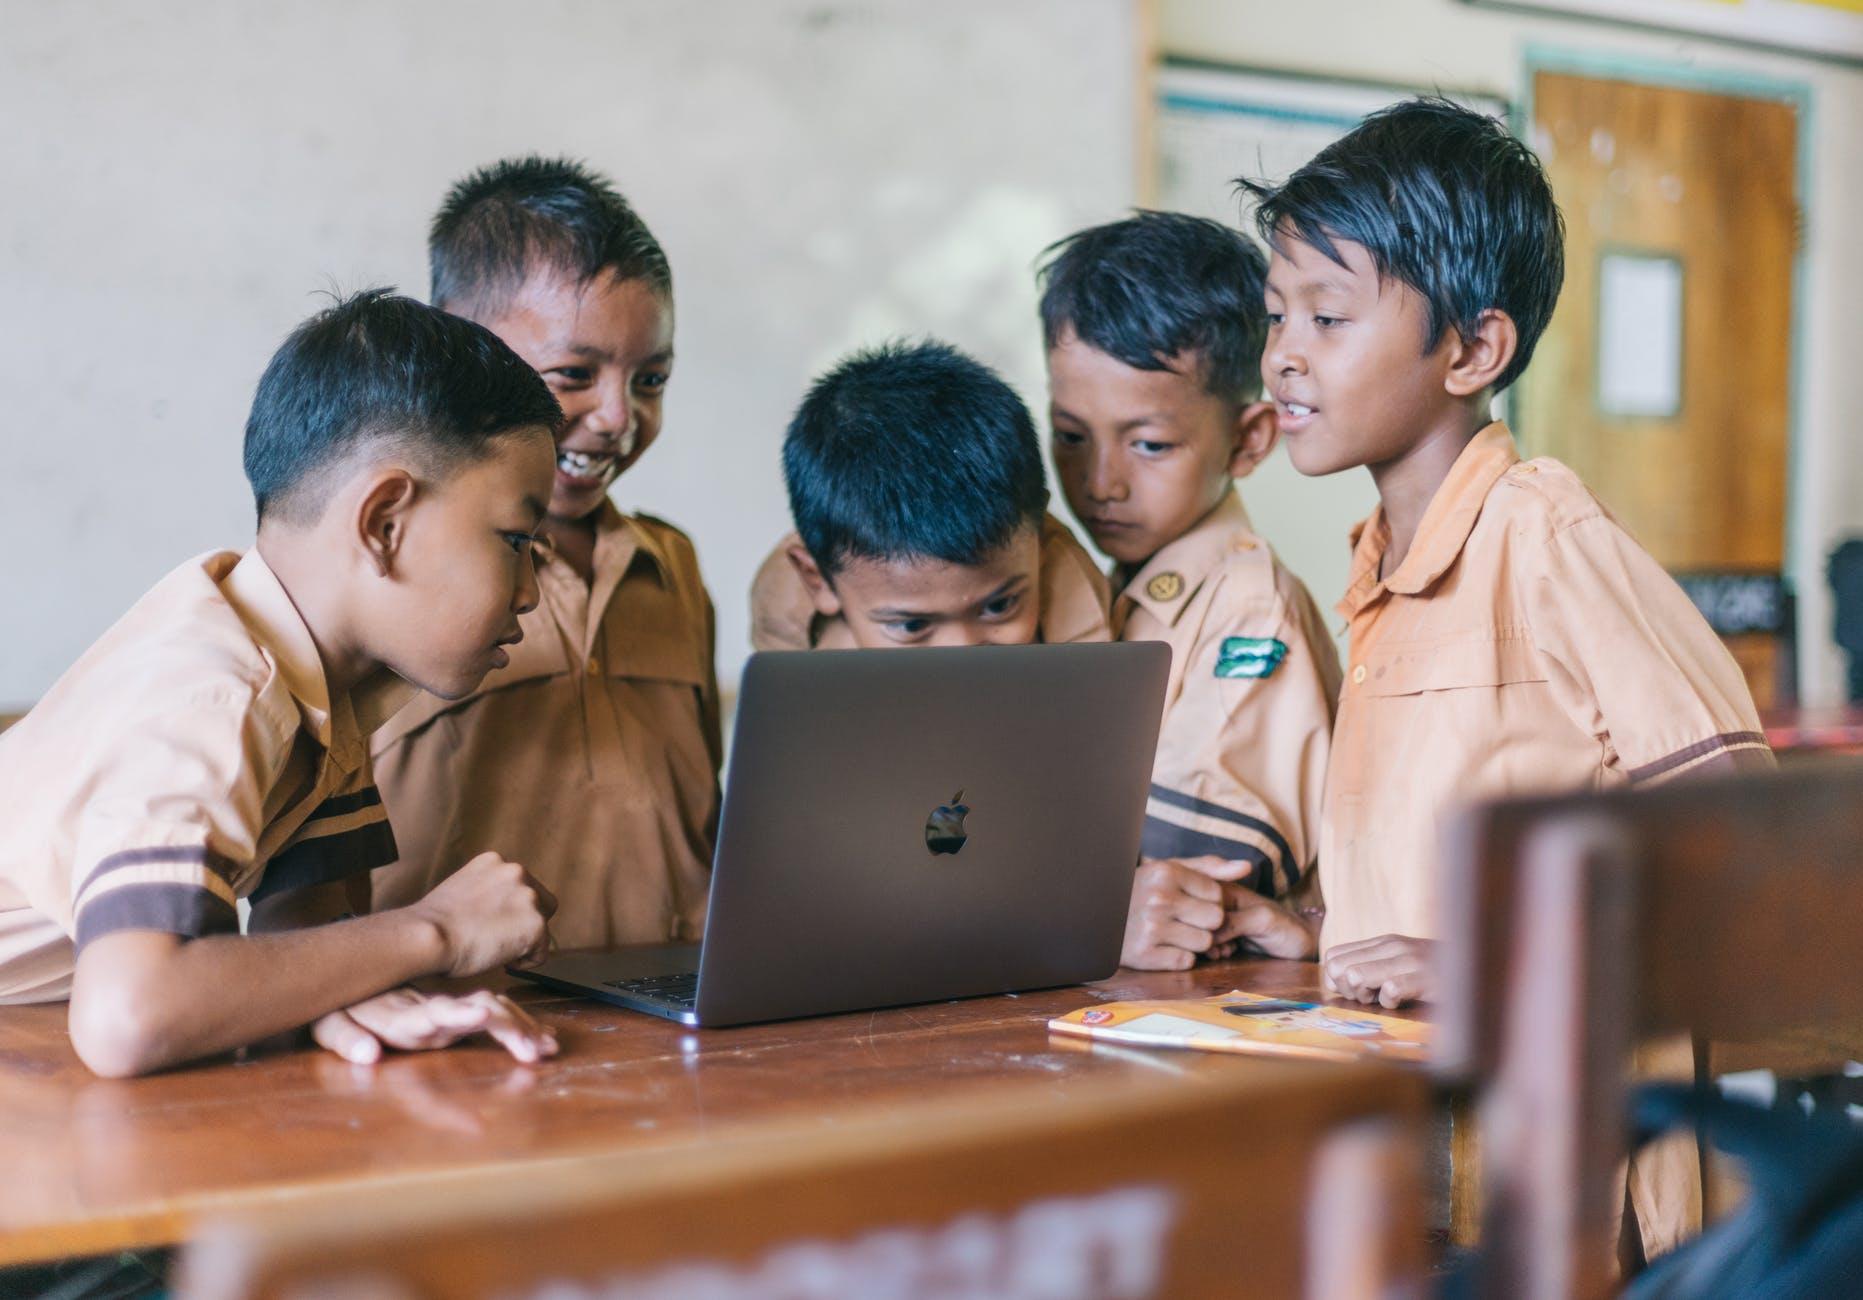 Kids smiling by looking at grey macbook